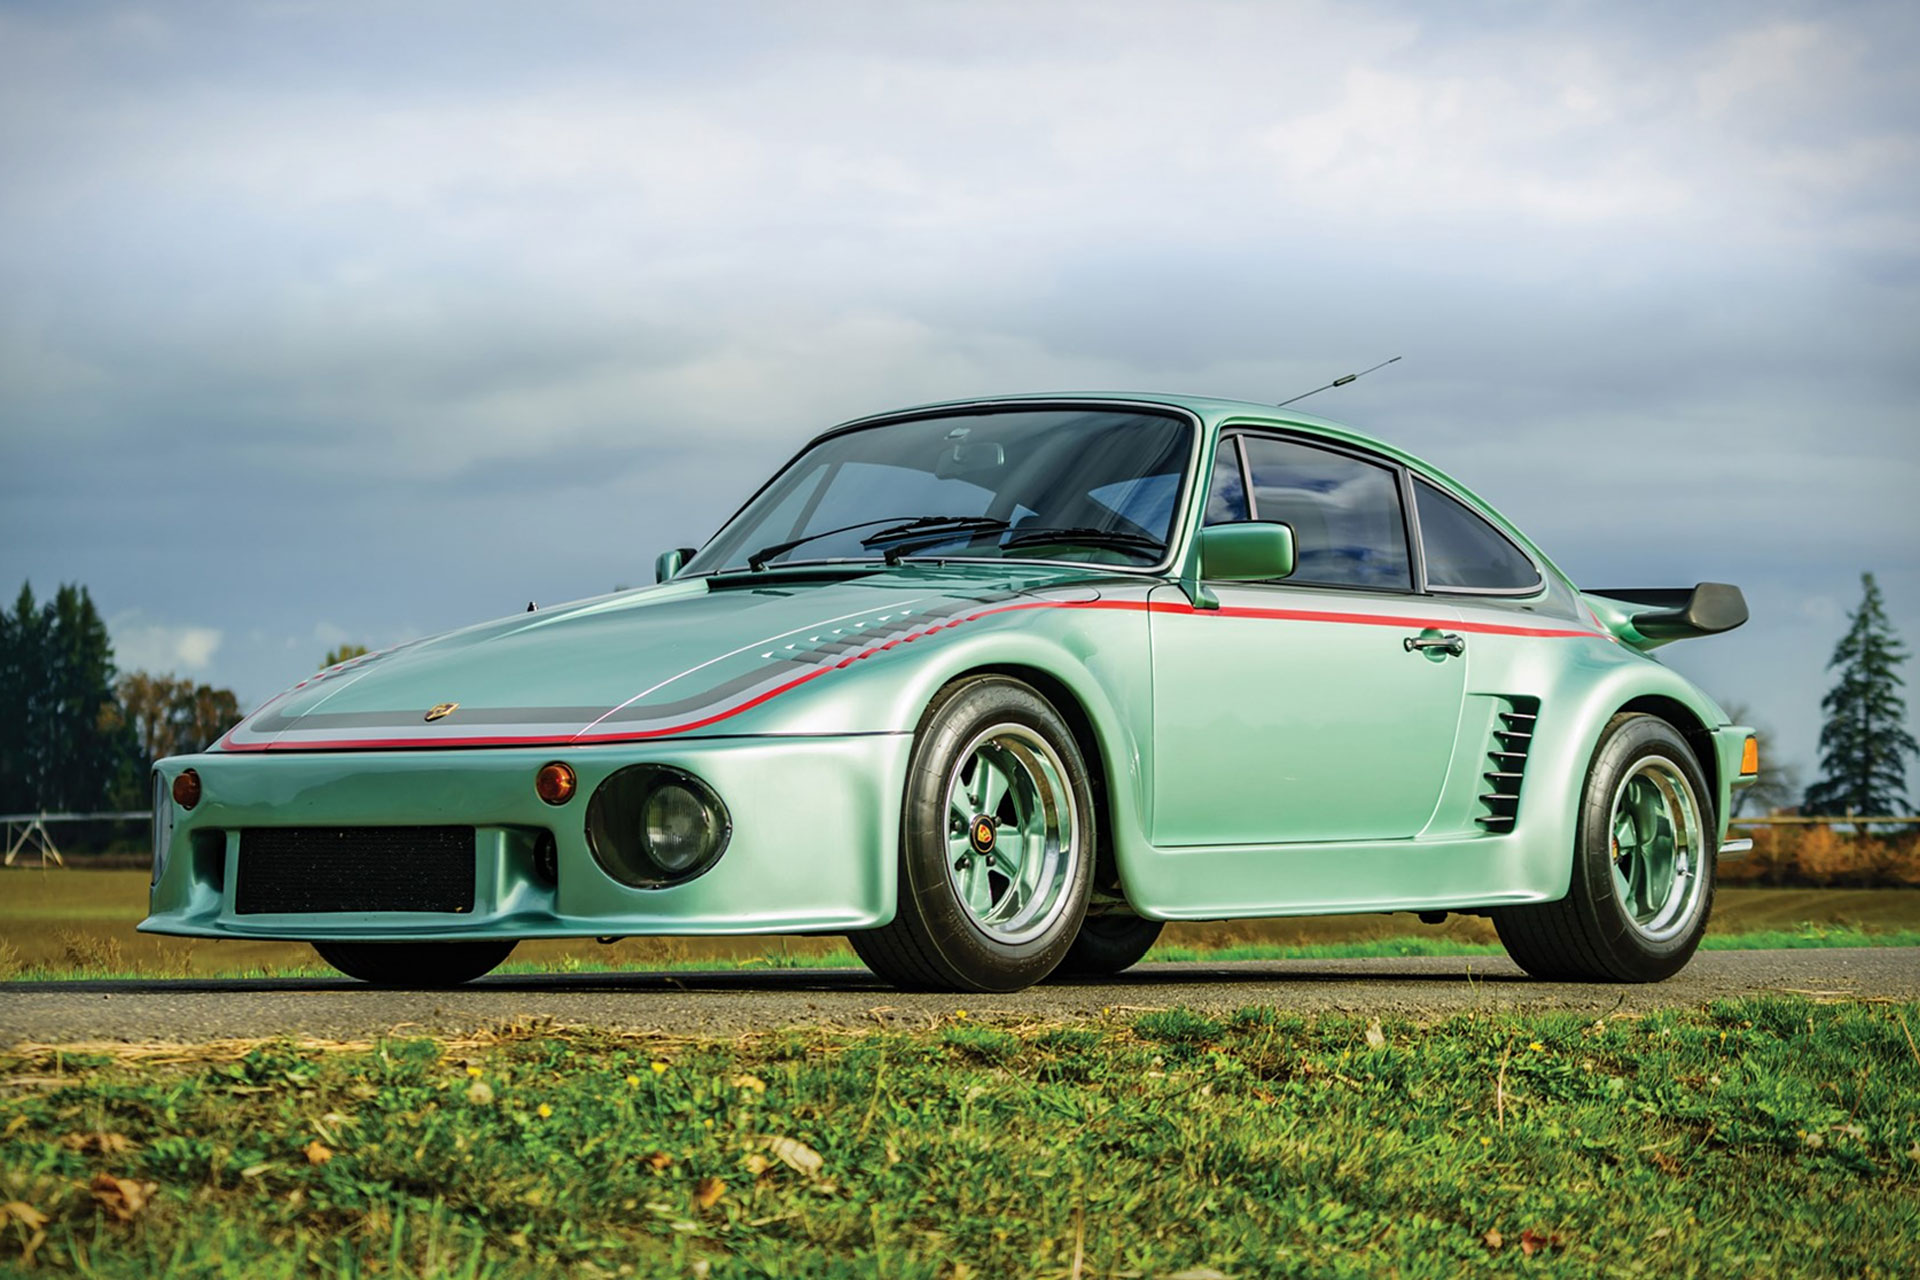 1976 Porsche 935 Kremer Group 5 Turbo